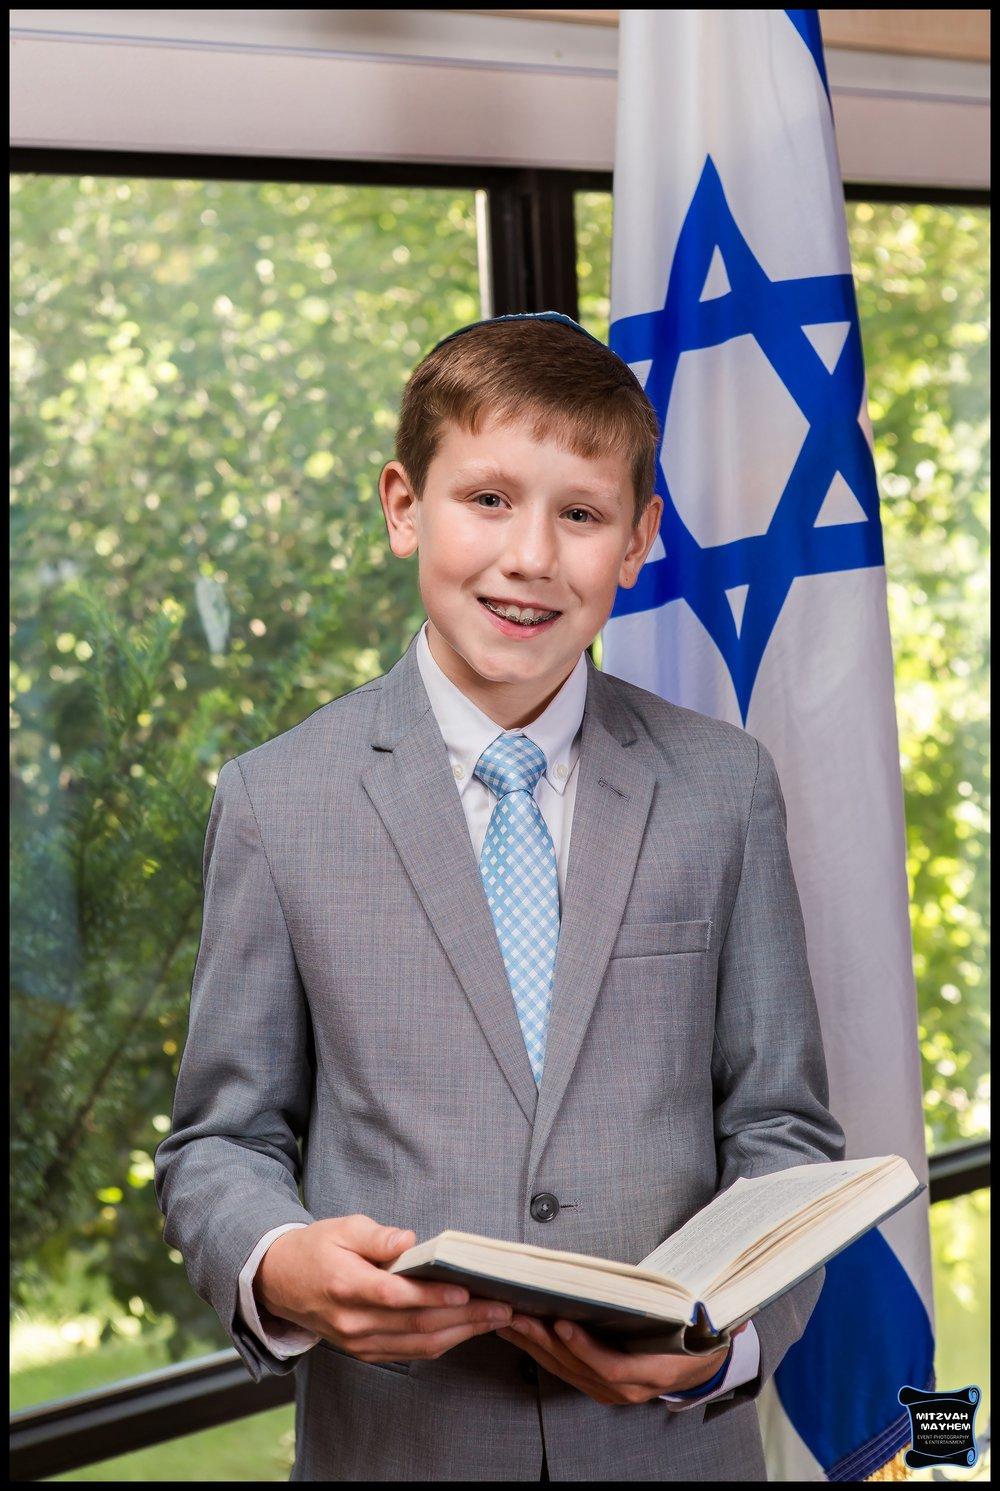 nj-temple-hatikvah-mitzvah-photo-6.jpg